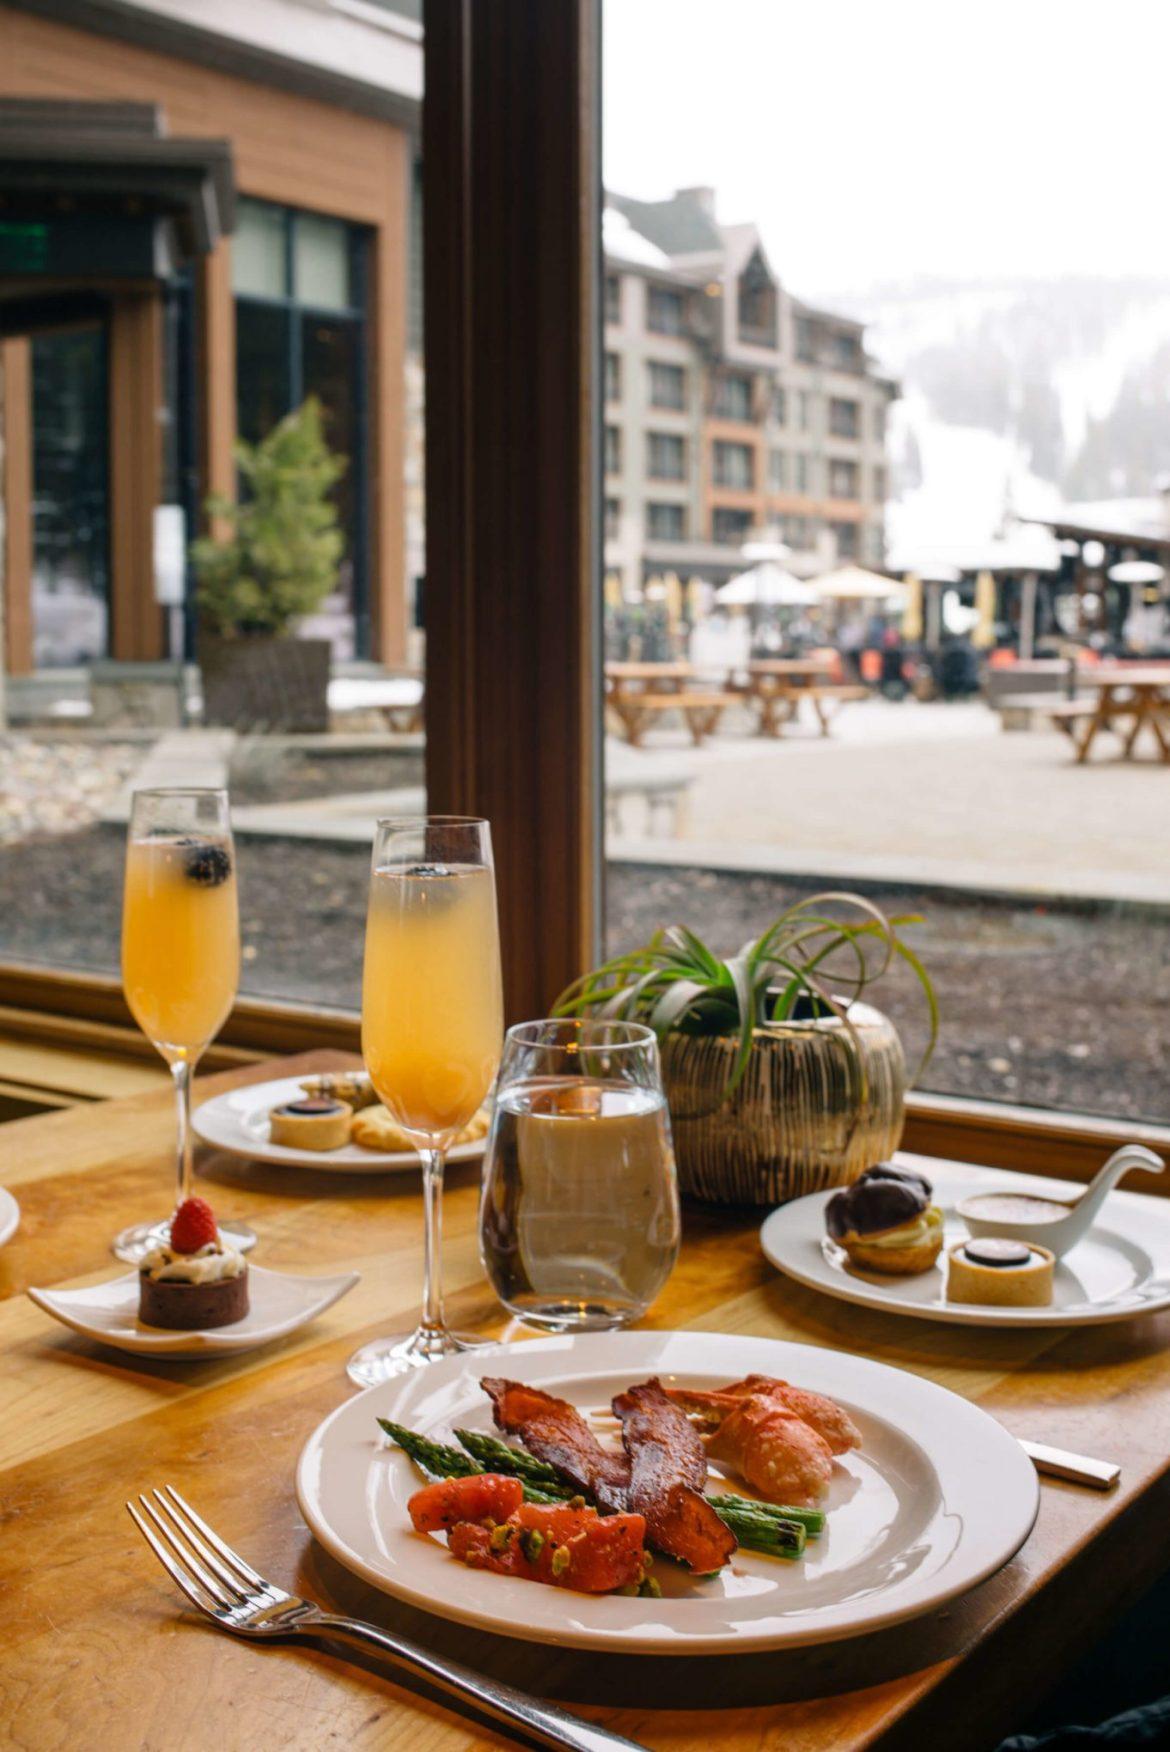 Brunch at Manzanita at The Ritz-Carlton Lake Tahoe CA overlooking the ski slopes, The Taste Edit